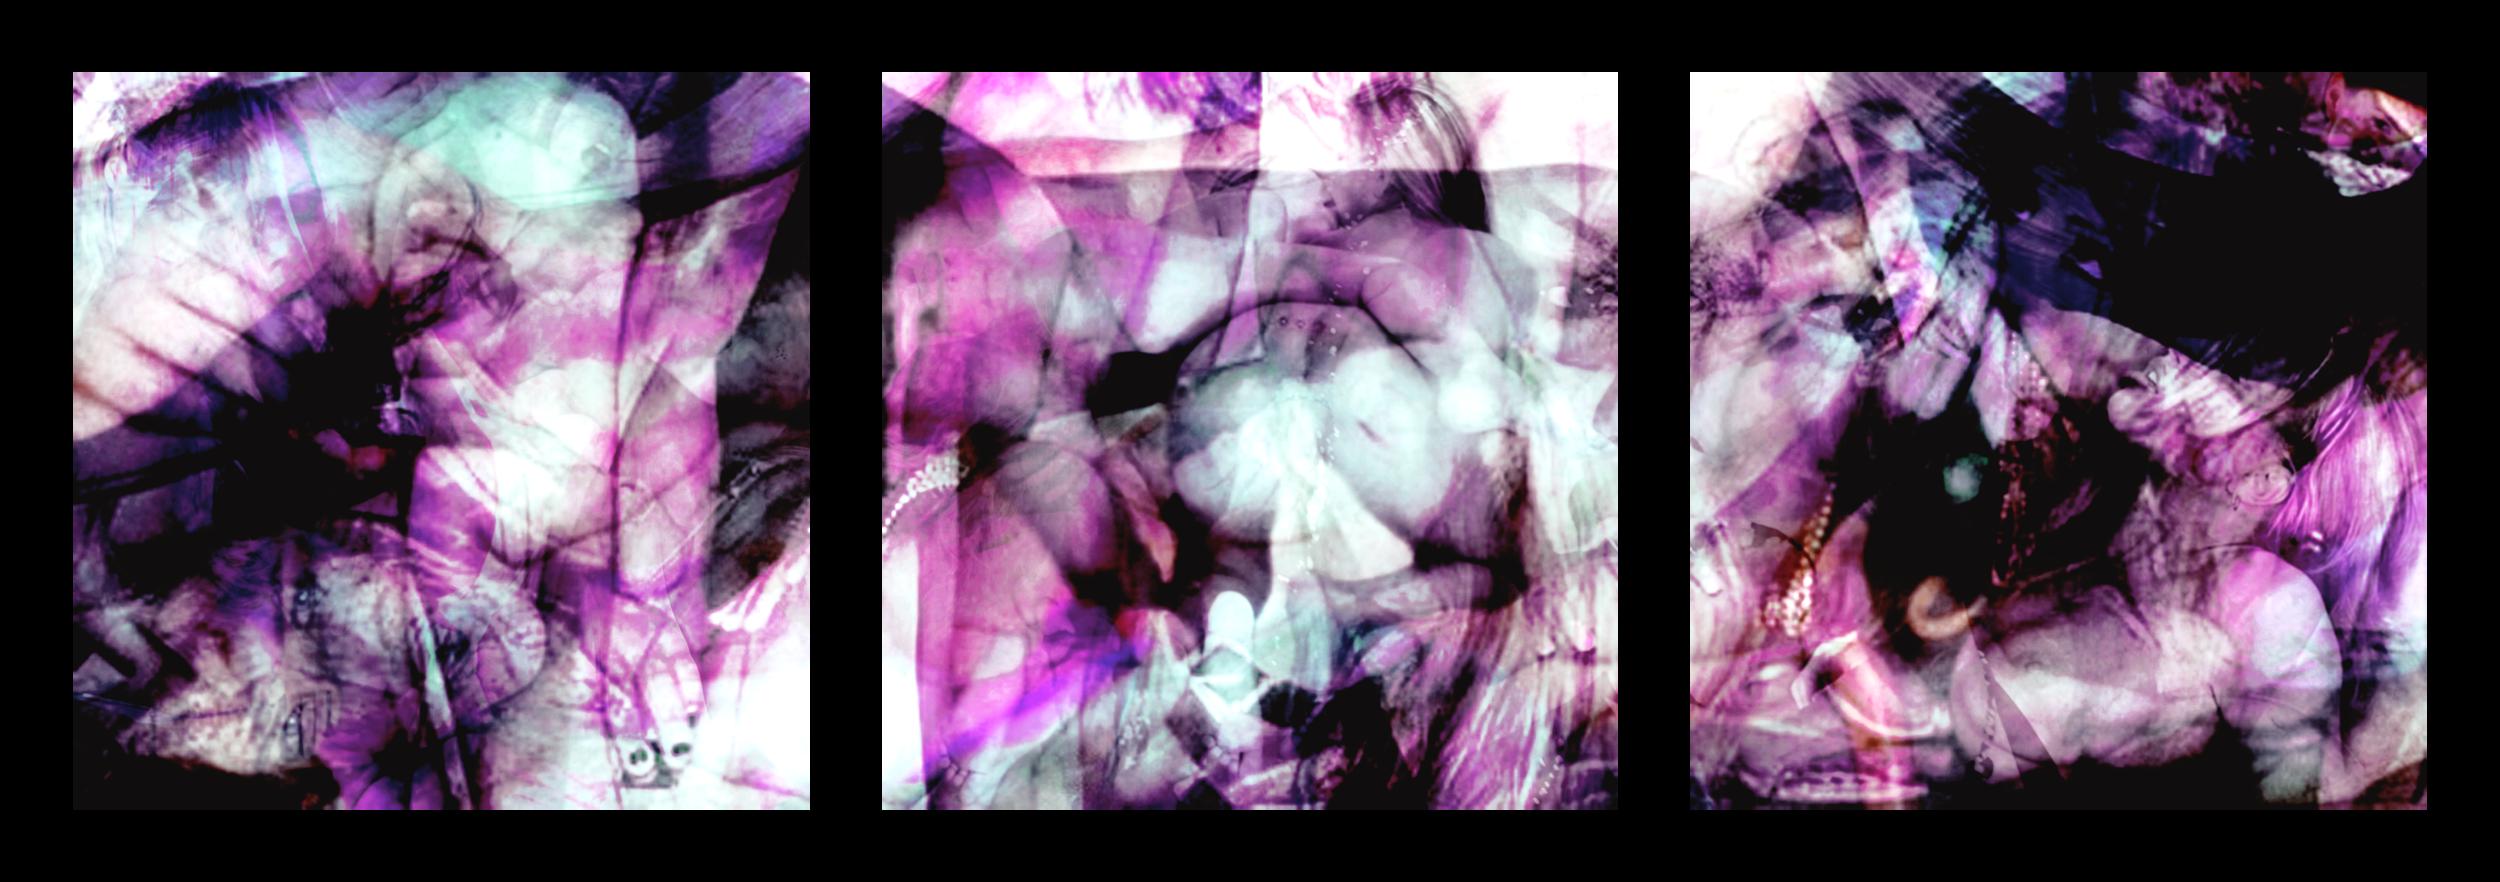 Overdose 11.1-3 (Triptych), 2008